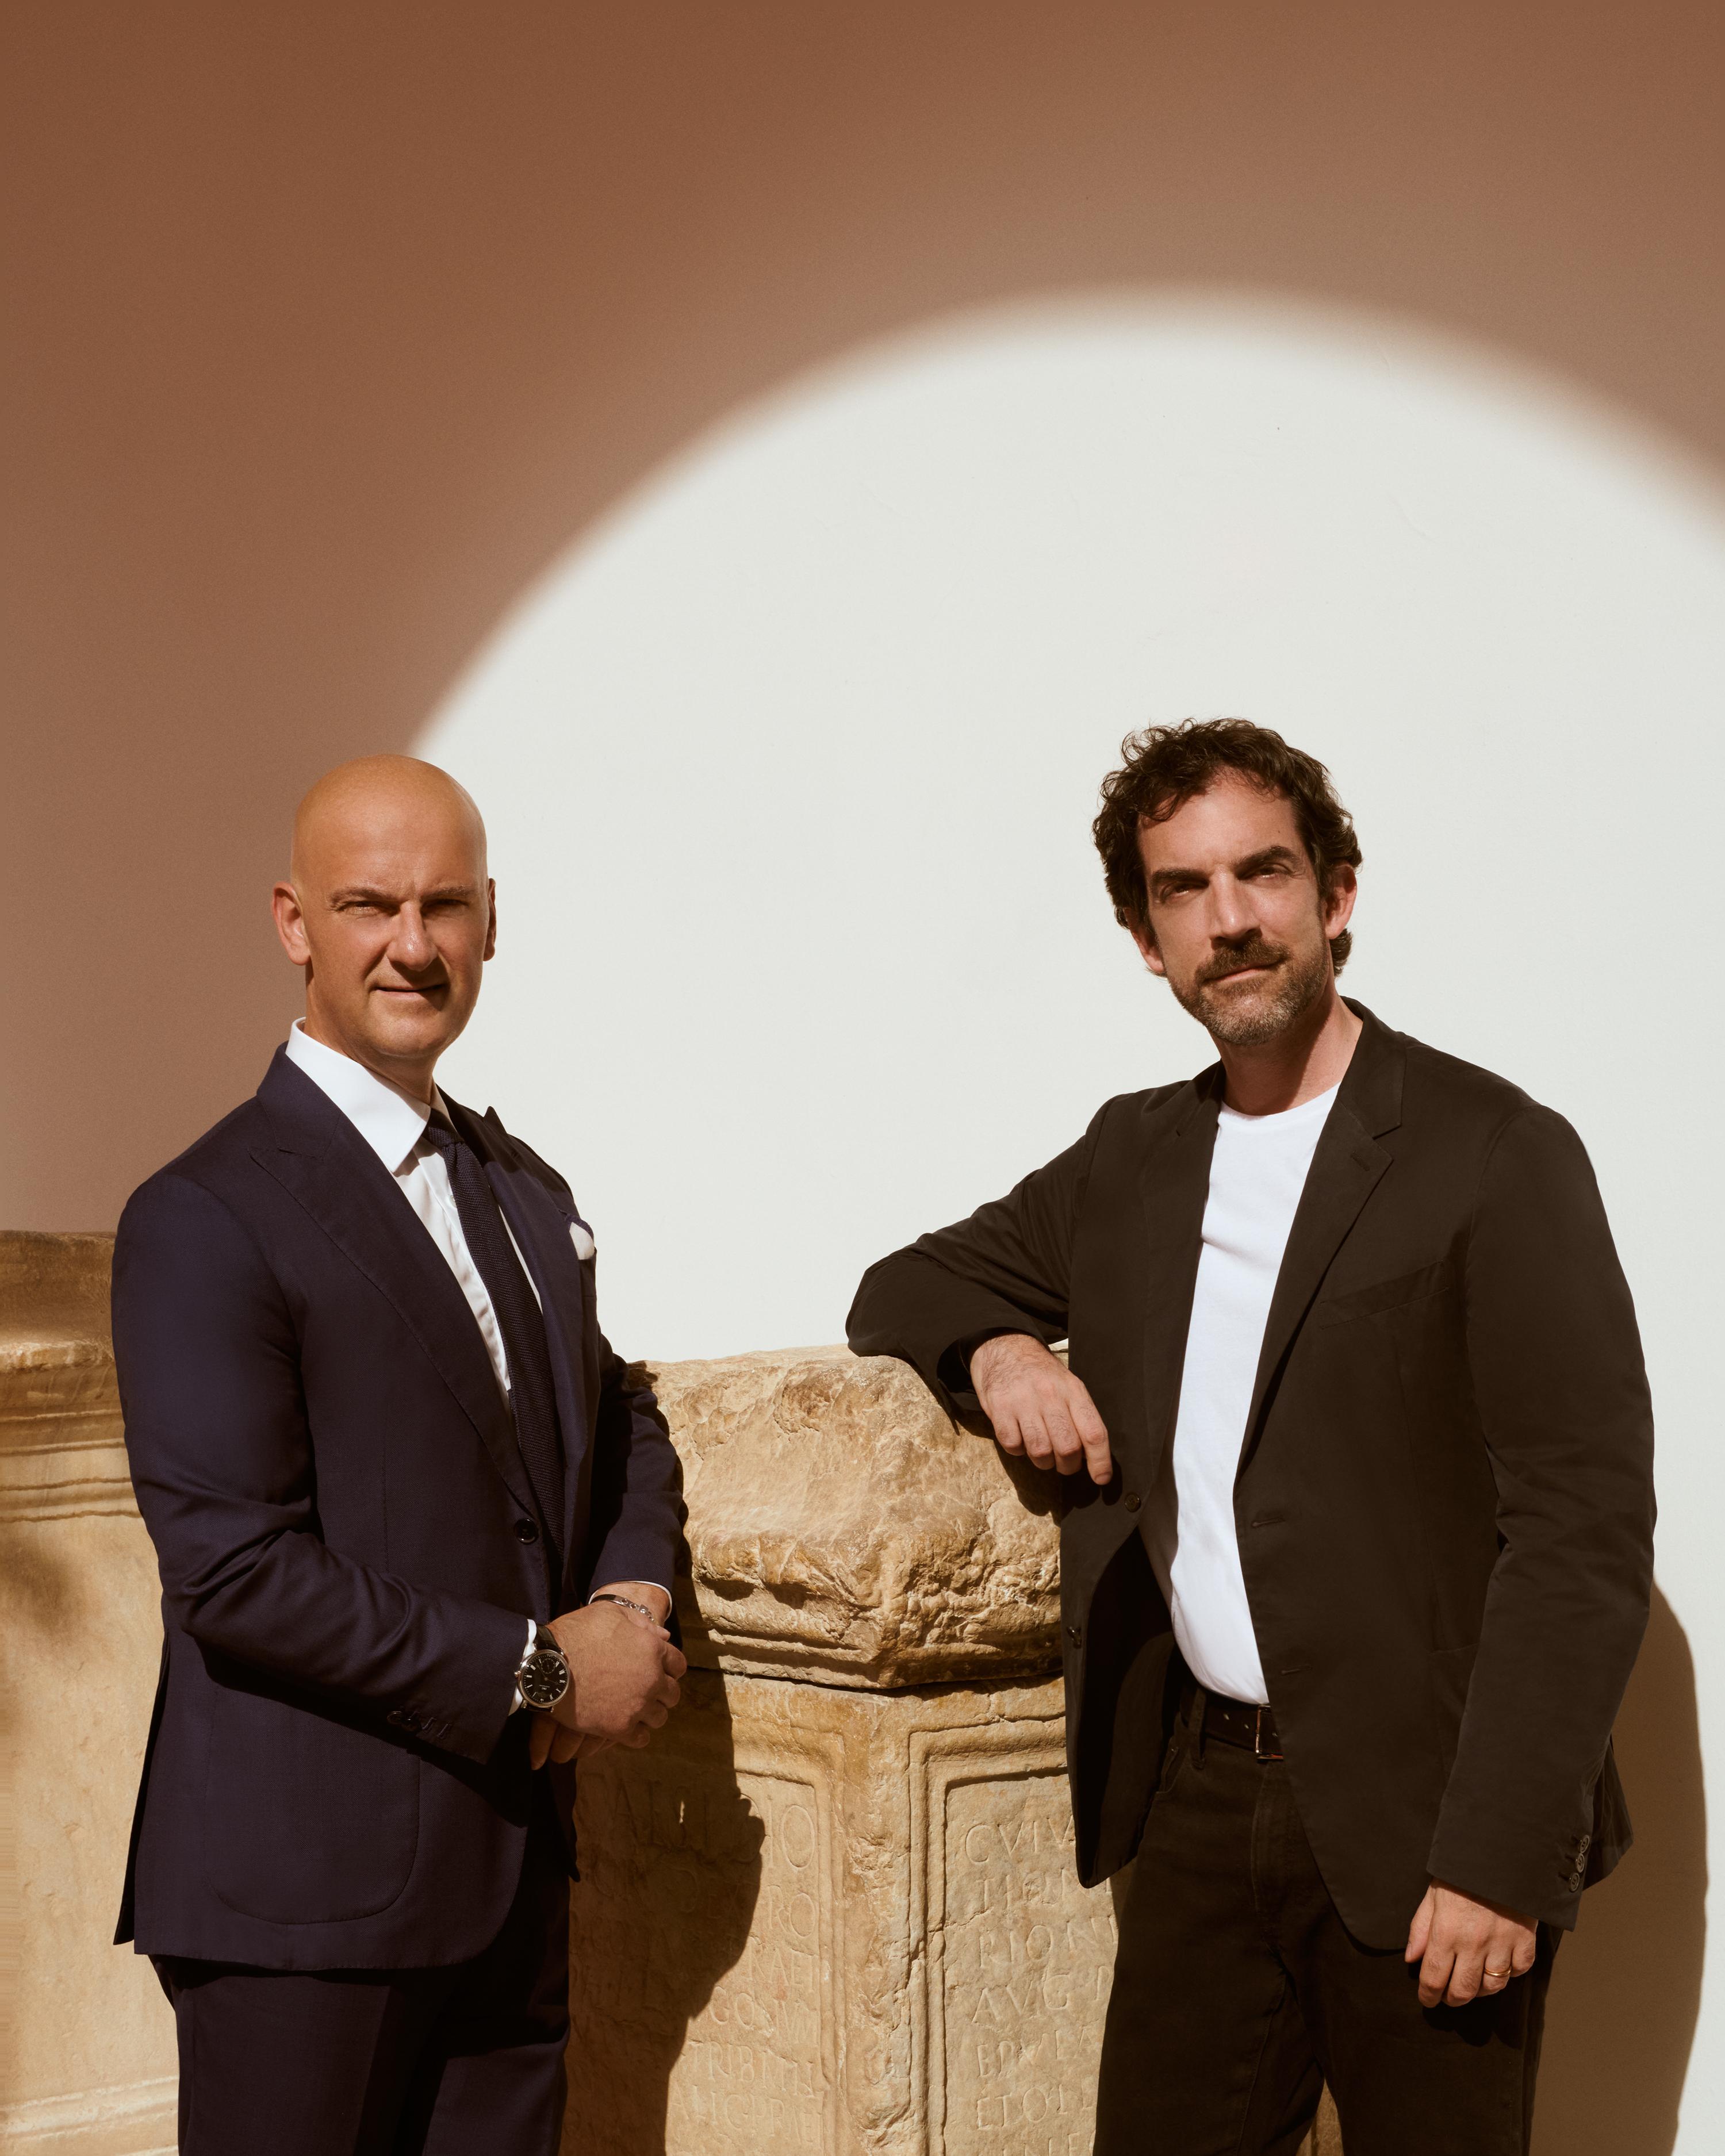 Giuseppe Santoni and Andrea Reinieri